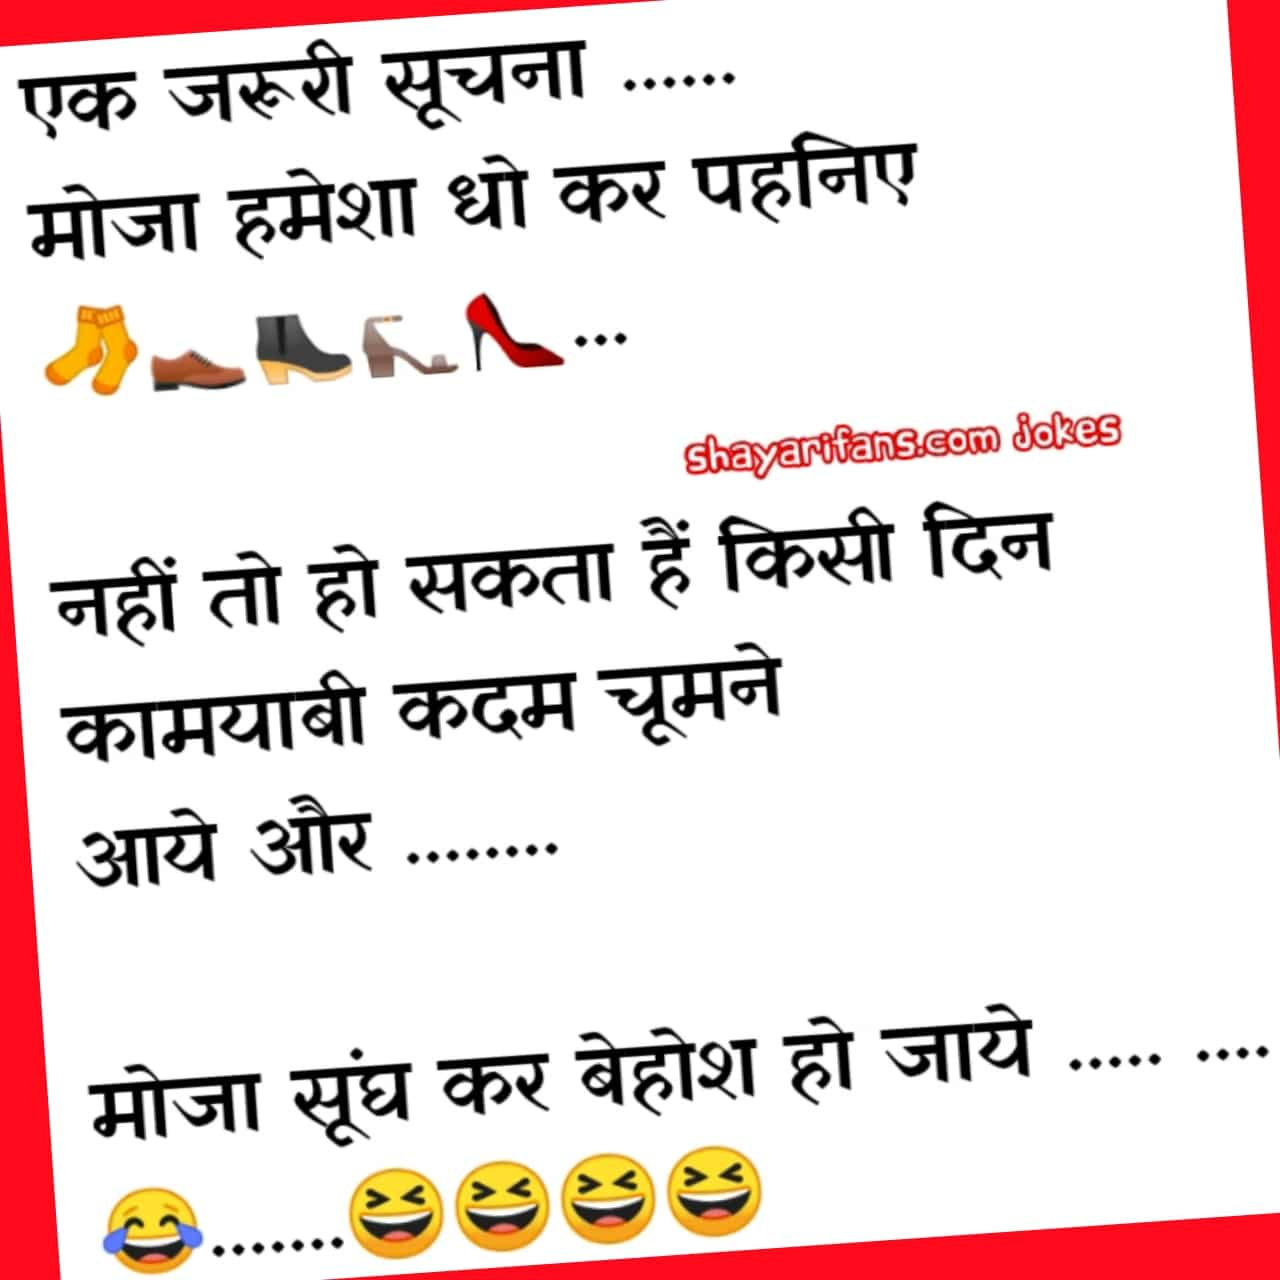 Jokes in hindi for whatsapp |  Jokes in hindi for whatsapp images - Shayarifans